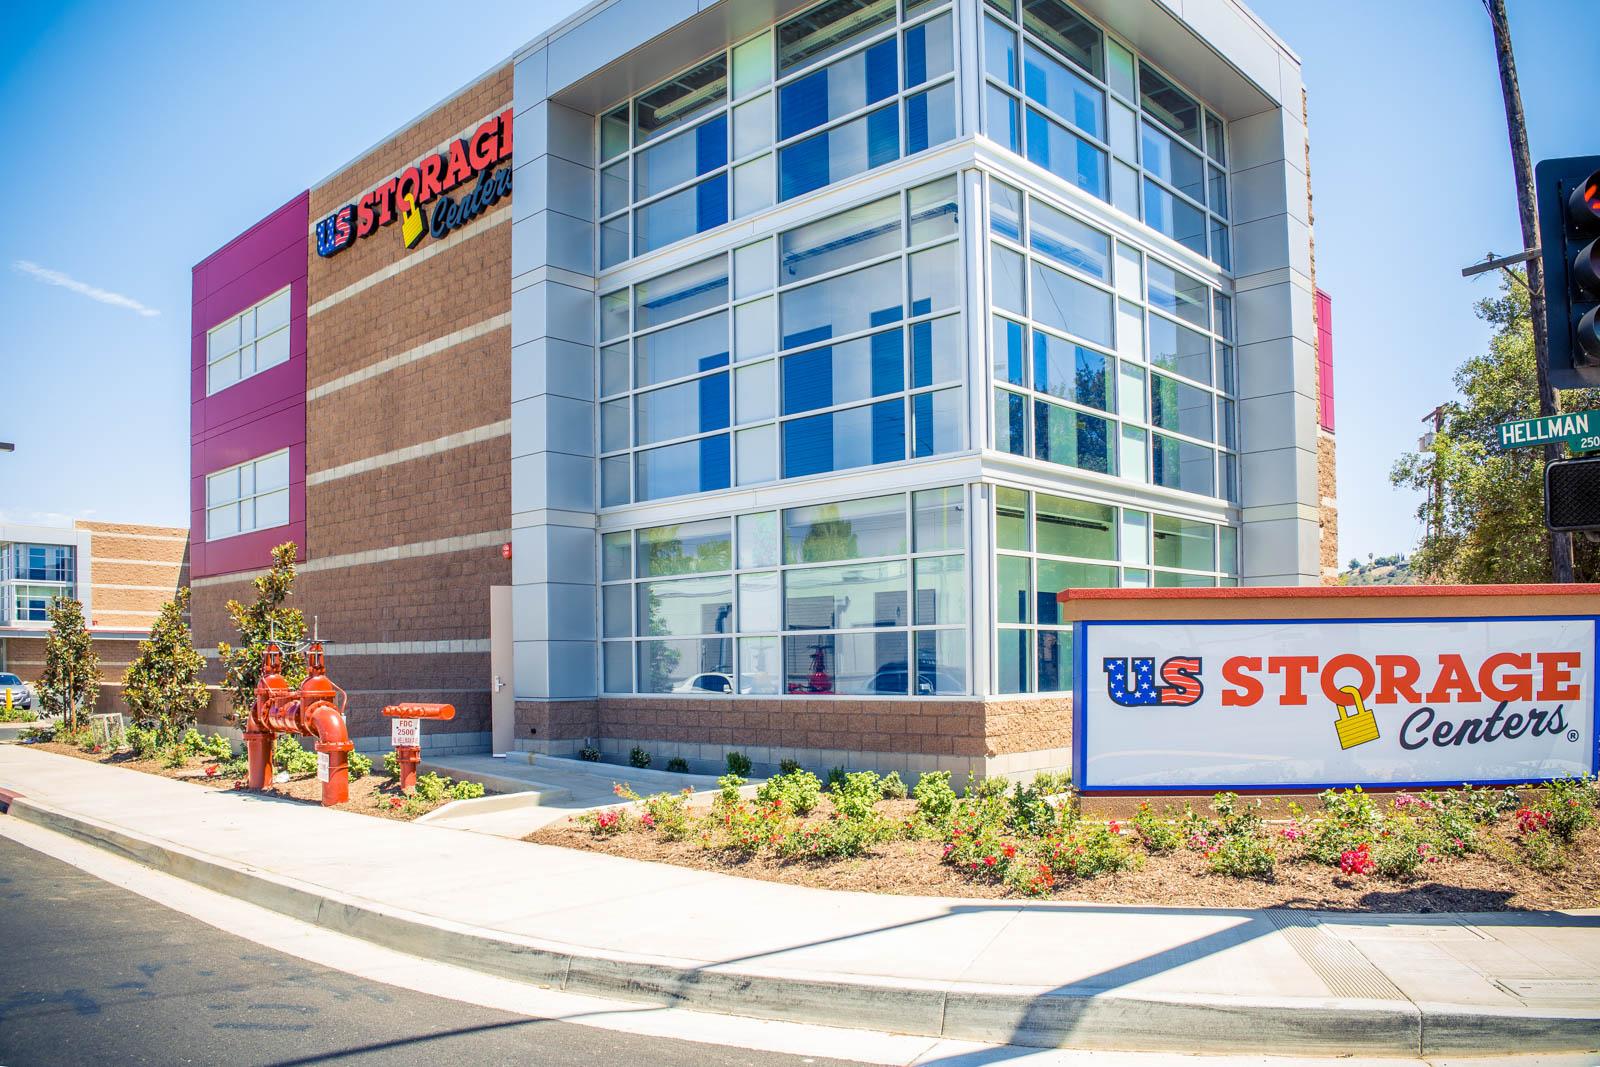 Charmant US Storage Centers